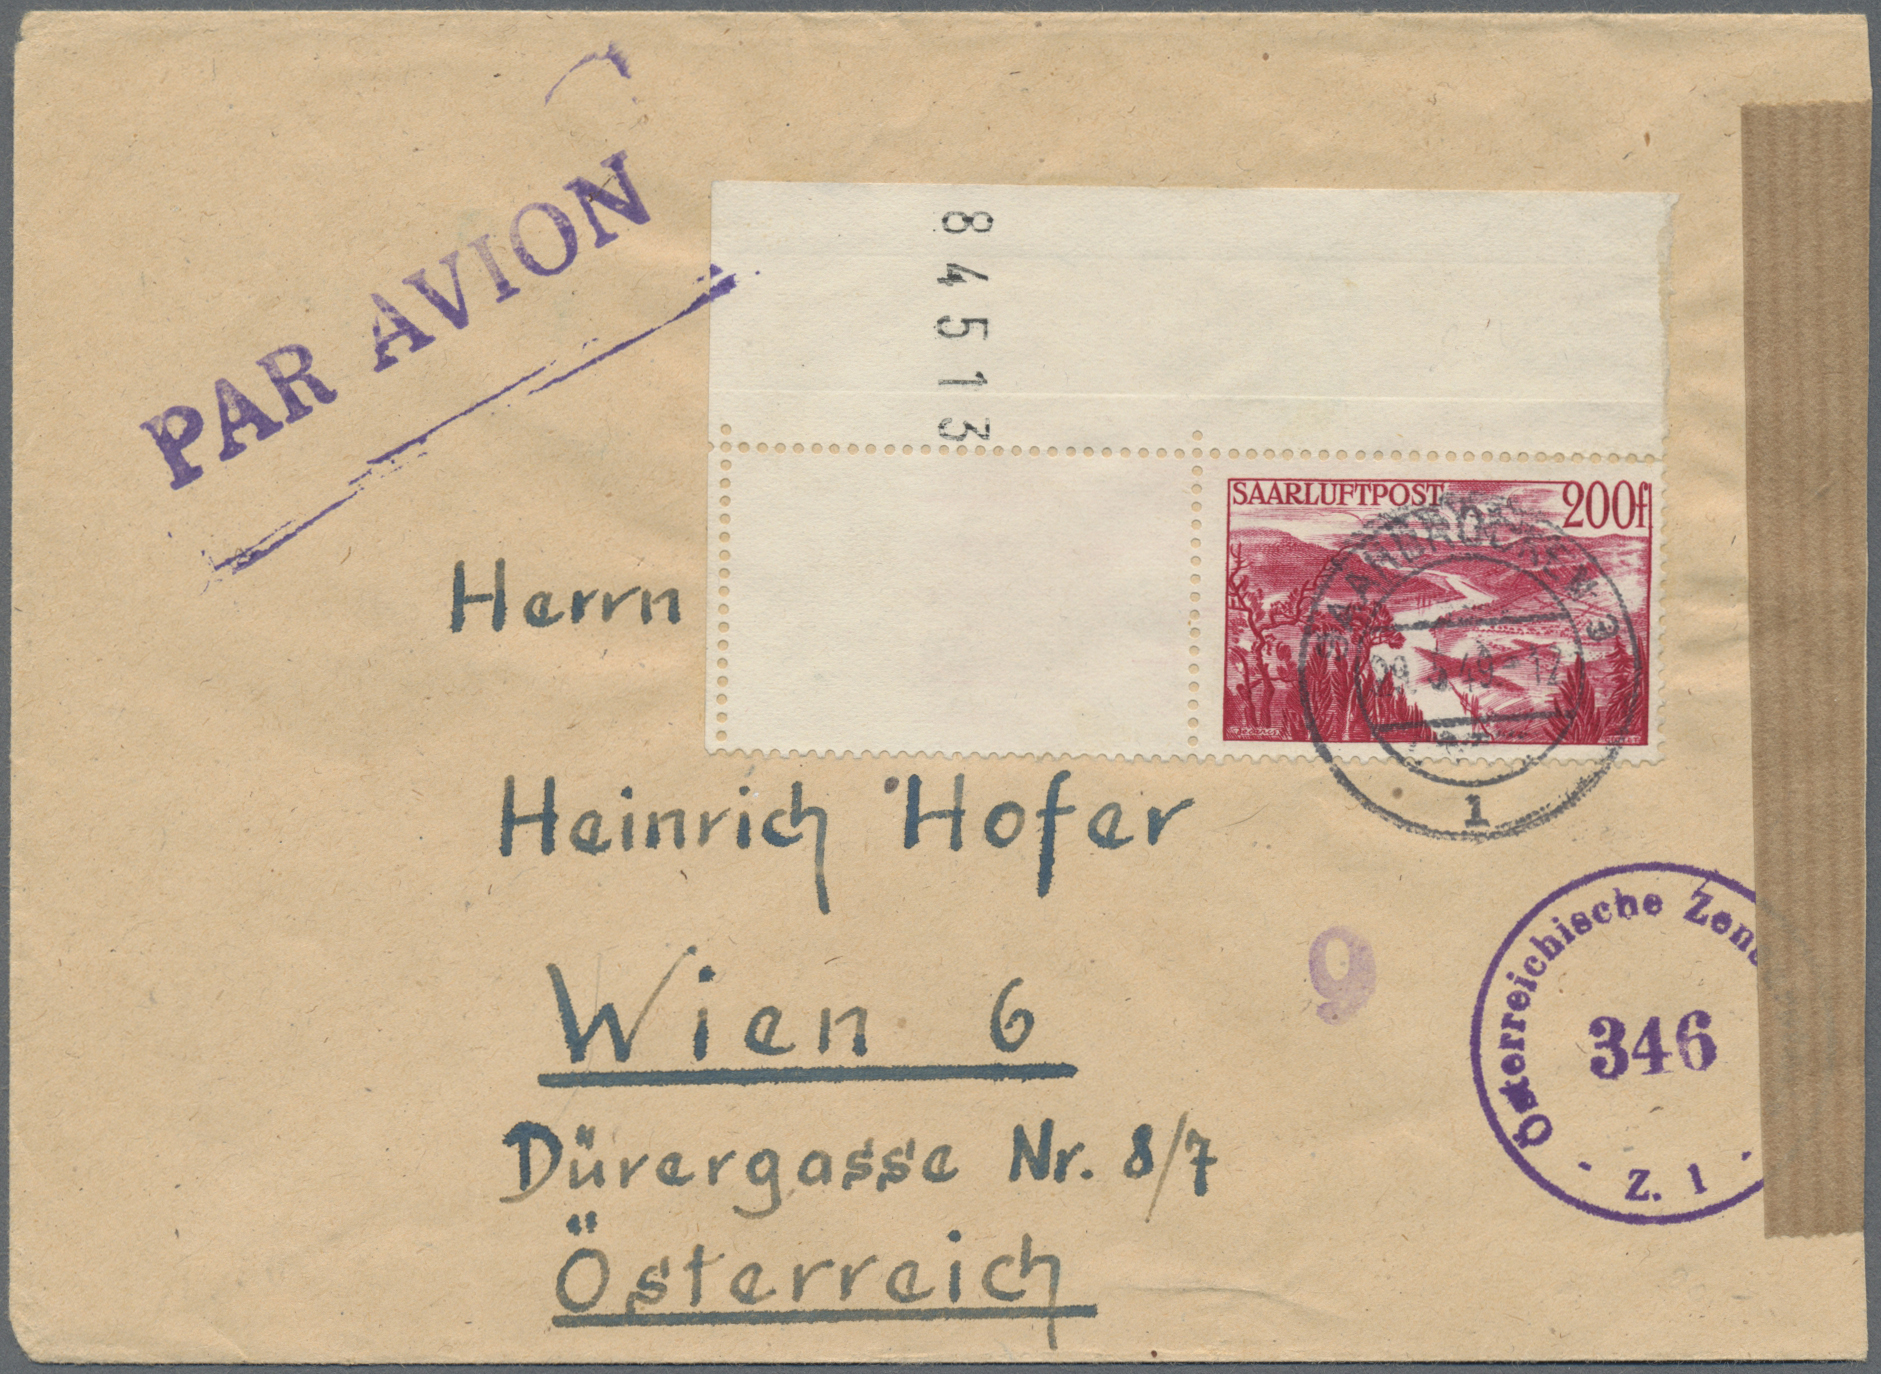 Lot 28863 - Deutsche Abstimmungsgebiete: Saargebiet  -  Auktionshaus Christoph Gärtner GmbH & Co. KG Sale #46 Gollcetions Germany - including the suplement